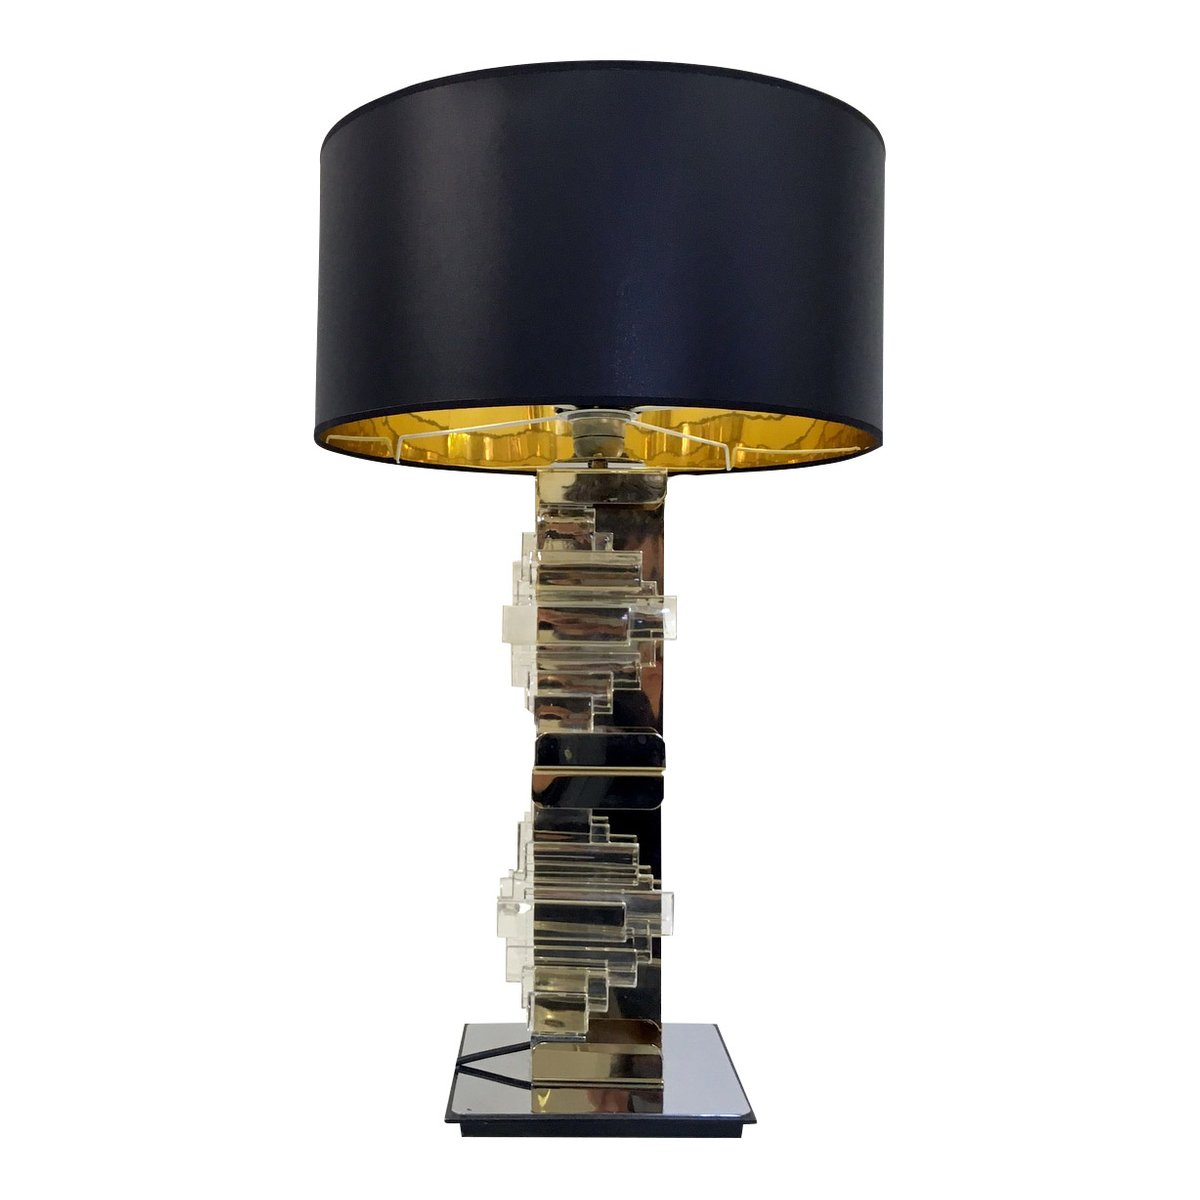 Vintage glass table lamps - Vintage Brass Chrome Glass Table Lamp By Gaetano Sciolari For Sciolari